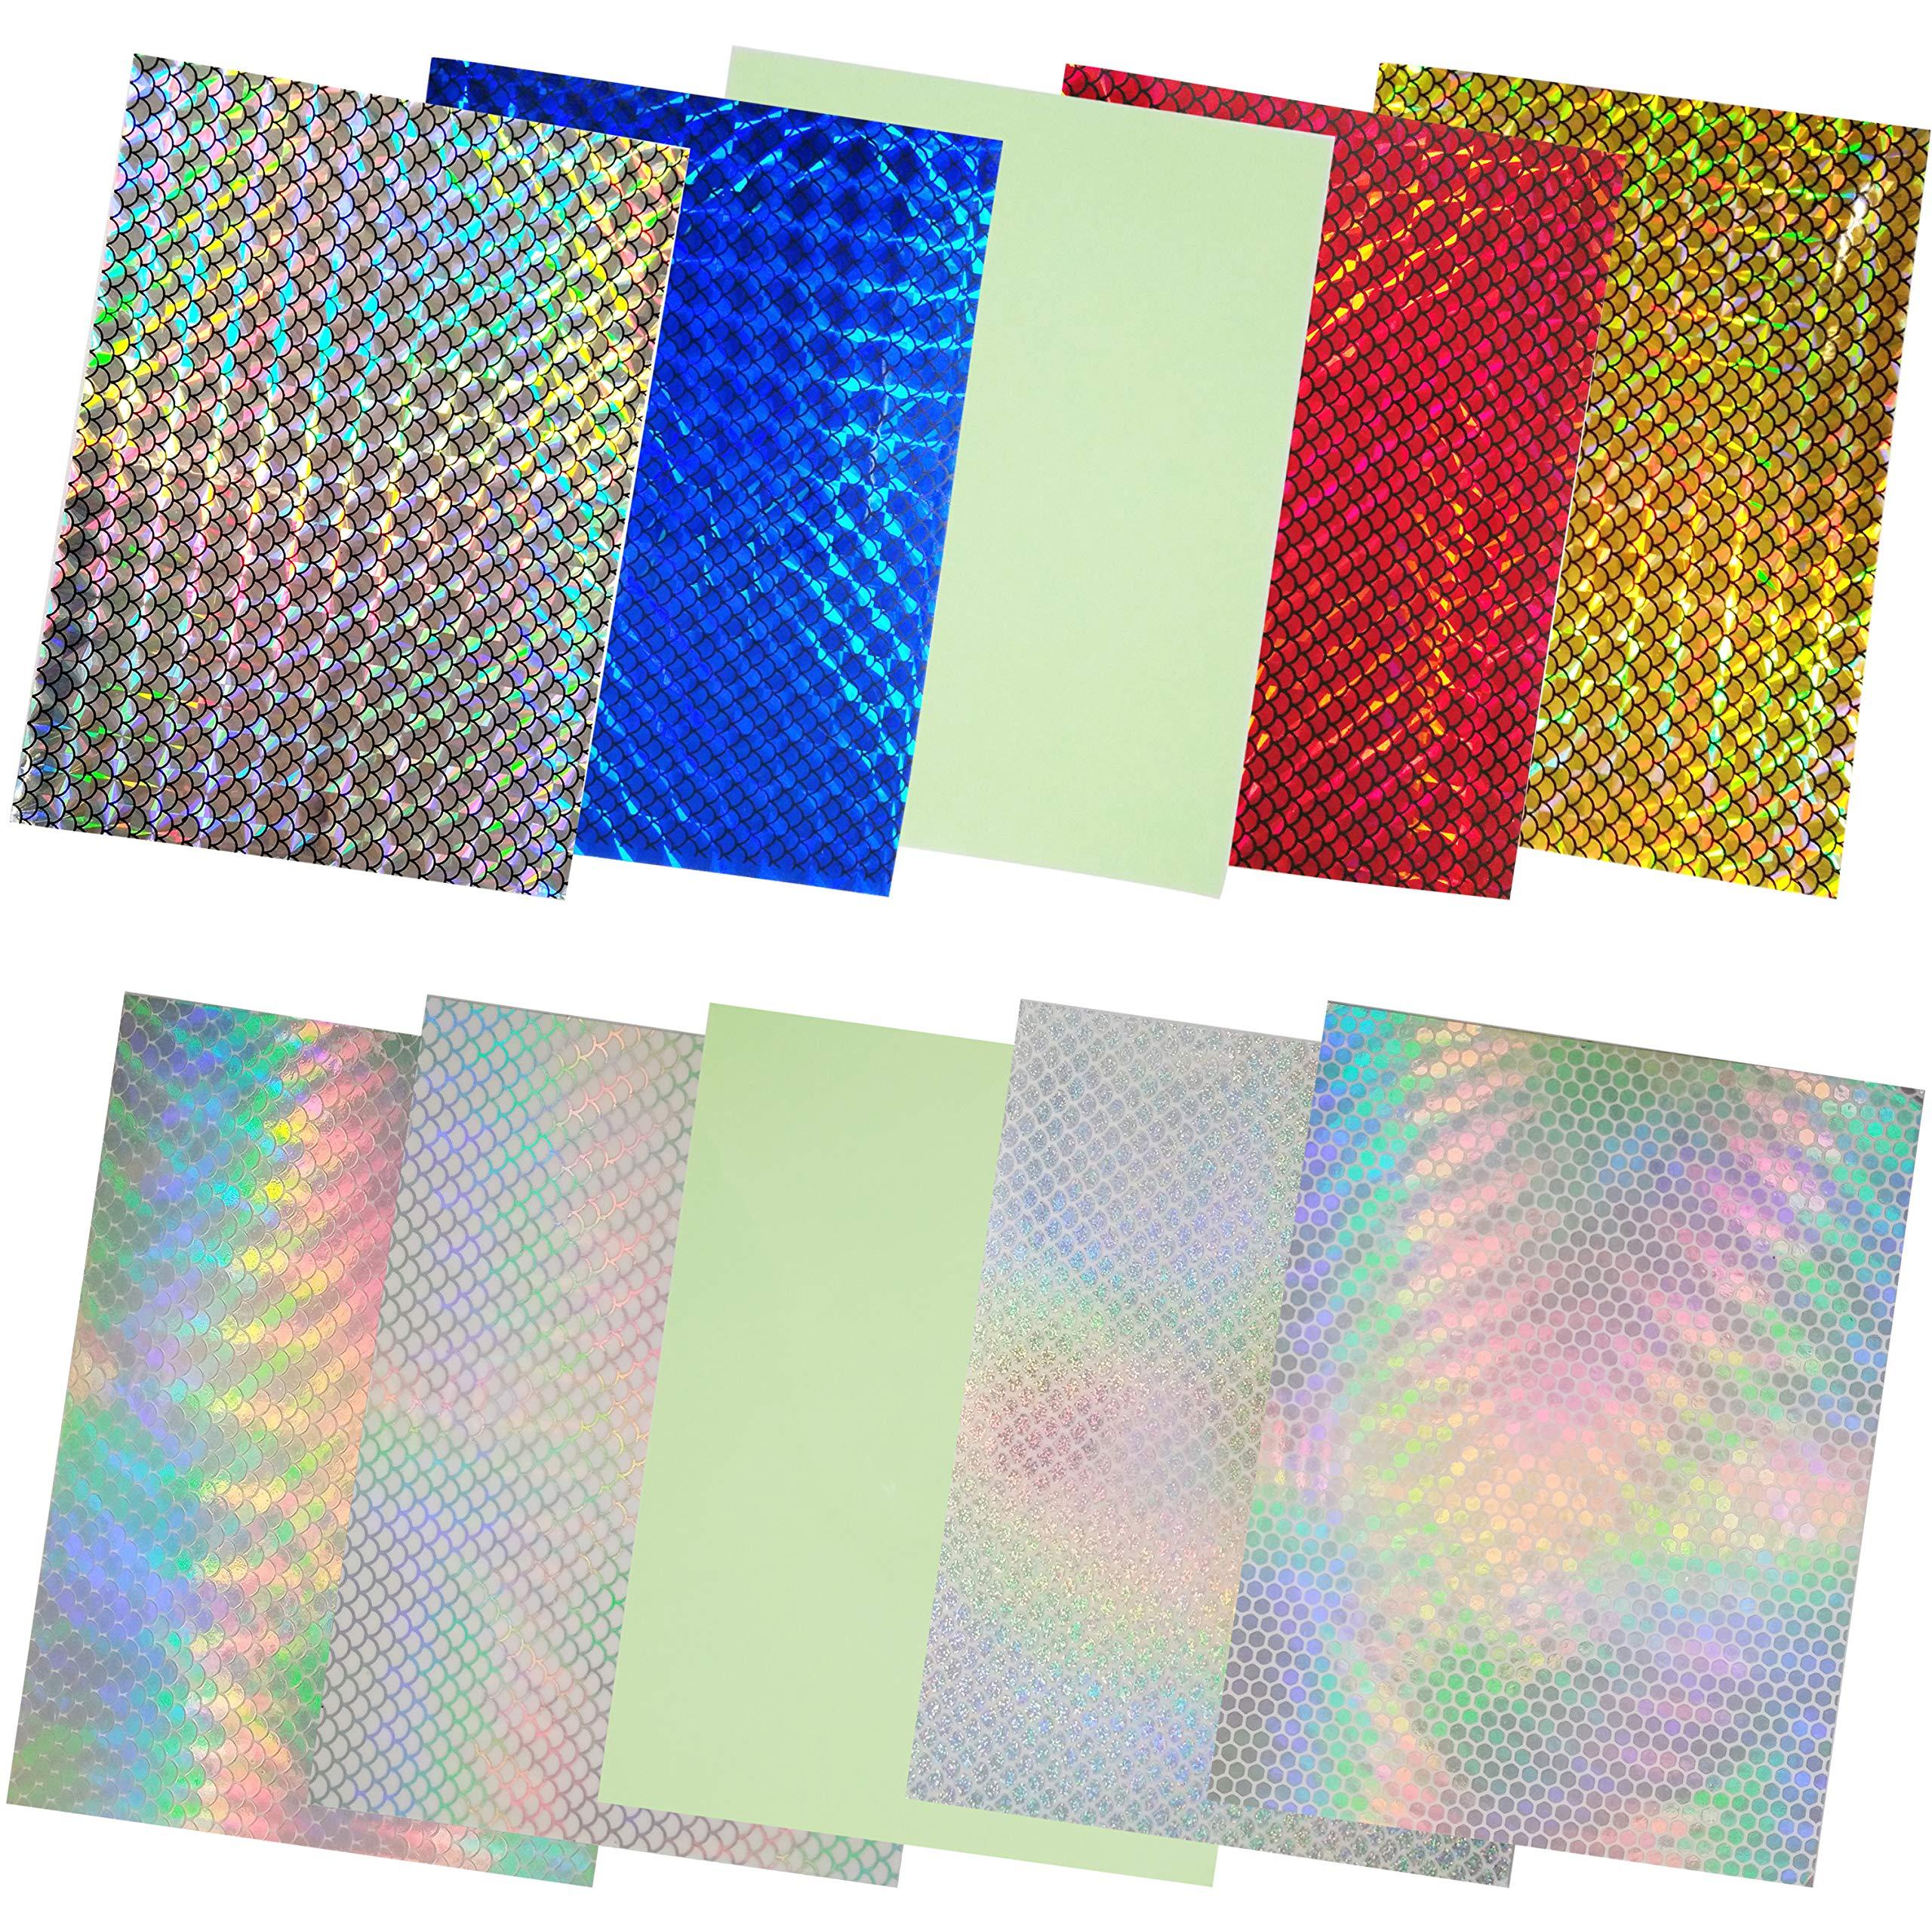 Details about  /Tape Lure Sticker DIY Modified Flash 20x10cm Scale Bait Useful Premium